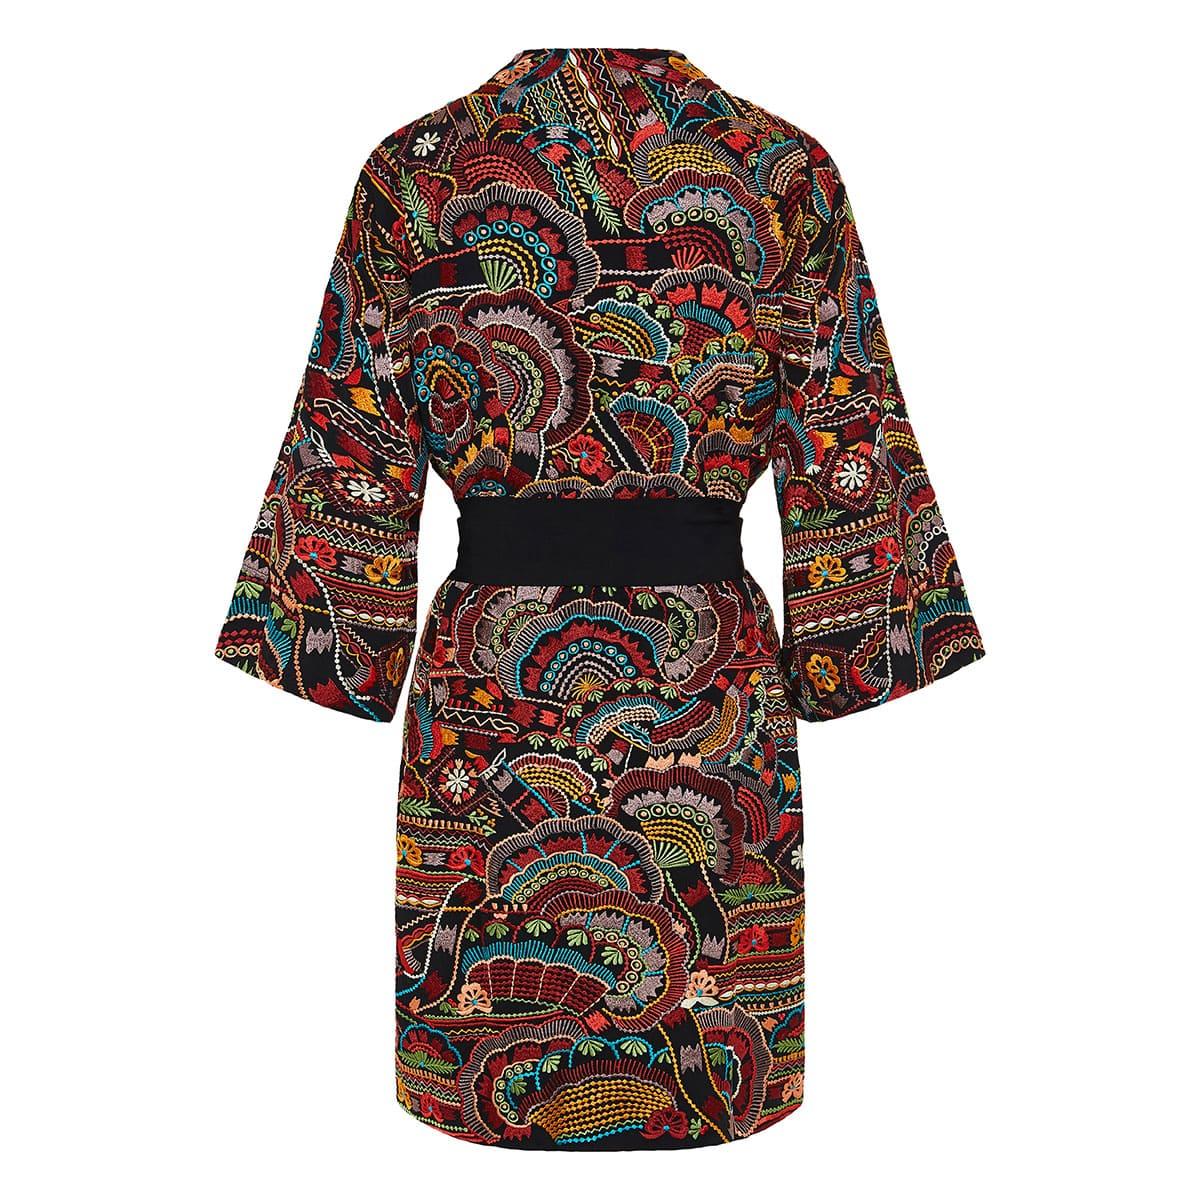 Urma embroidered mini robe dress